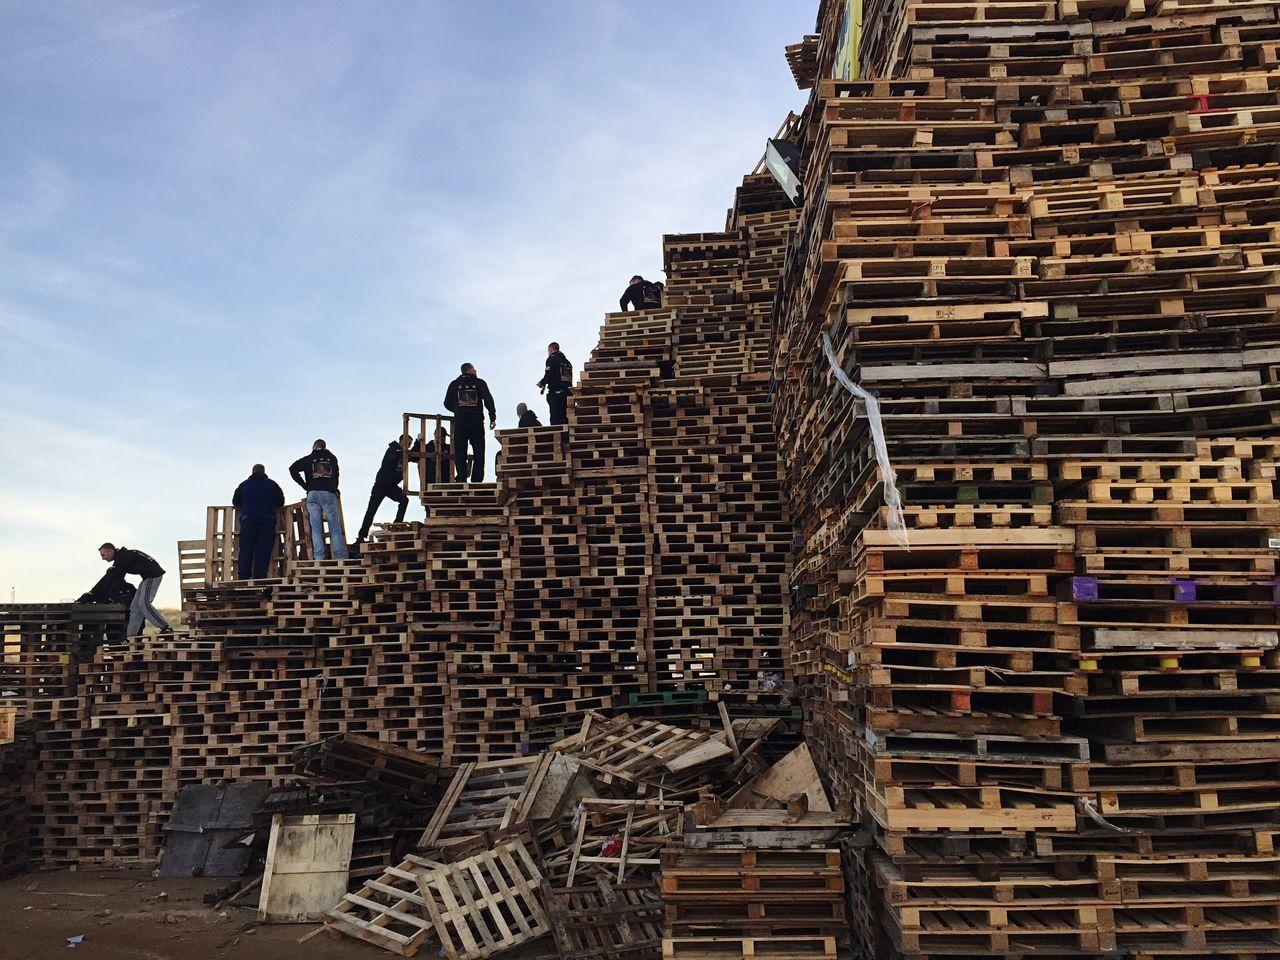 Vreugdevuur Duindorp Palettes Nye 2015 Pile Built Structure Builders Getting A Tan